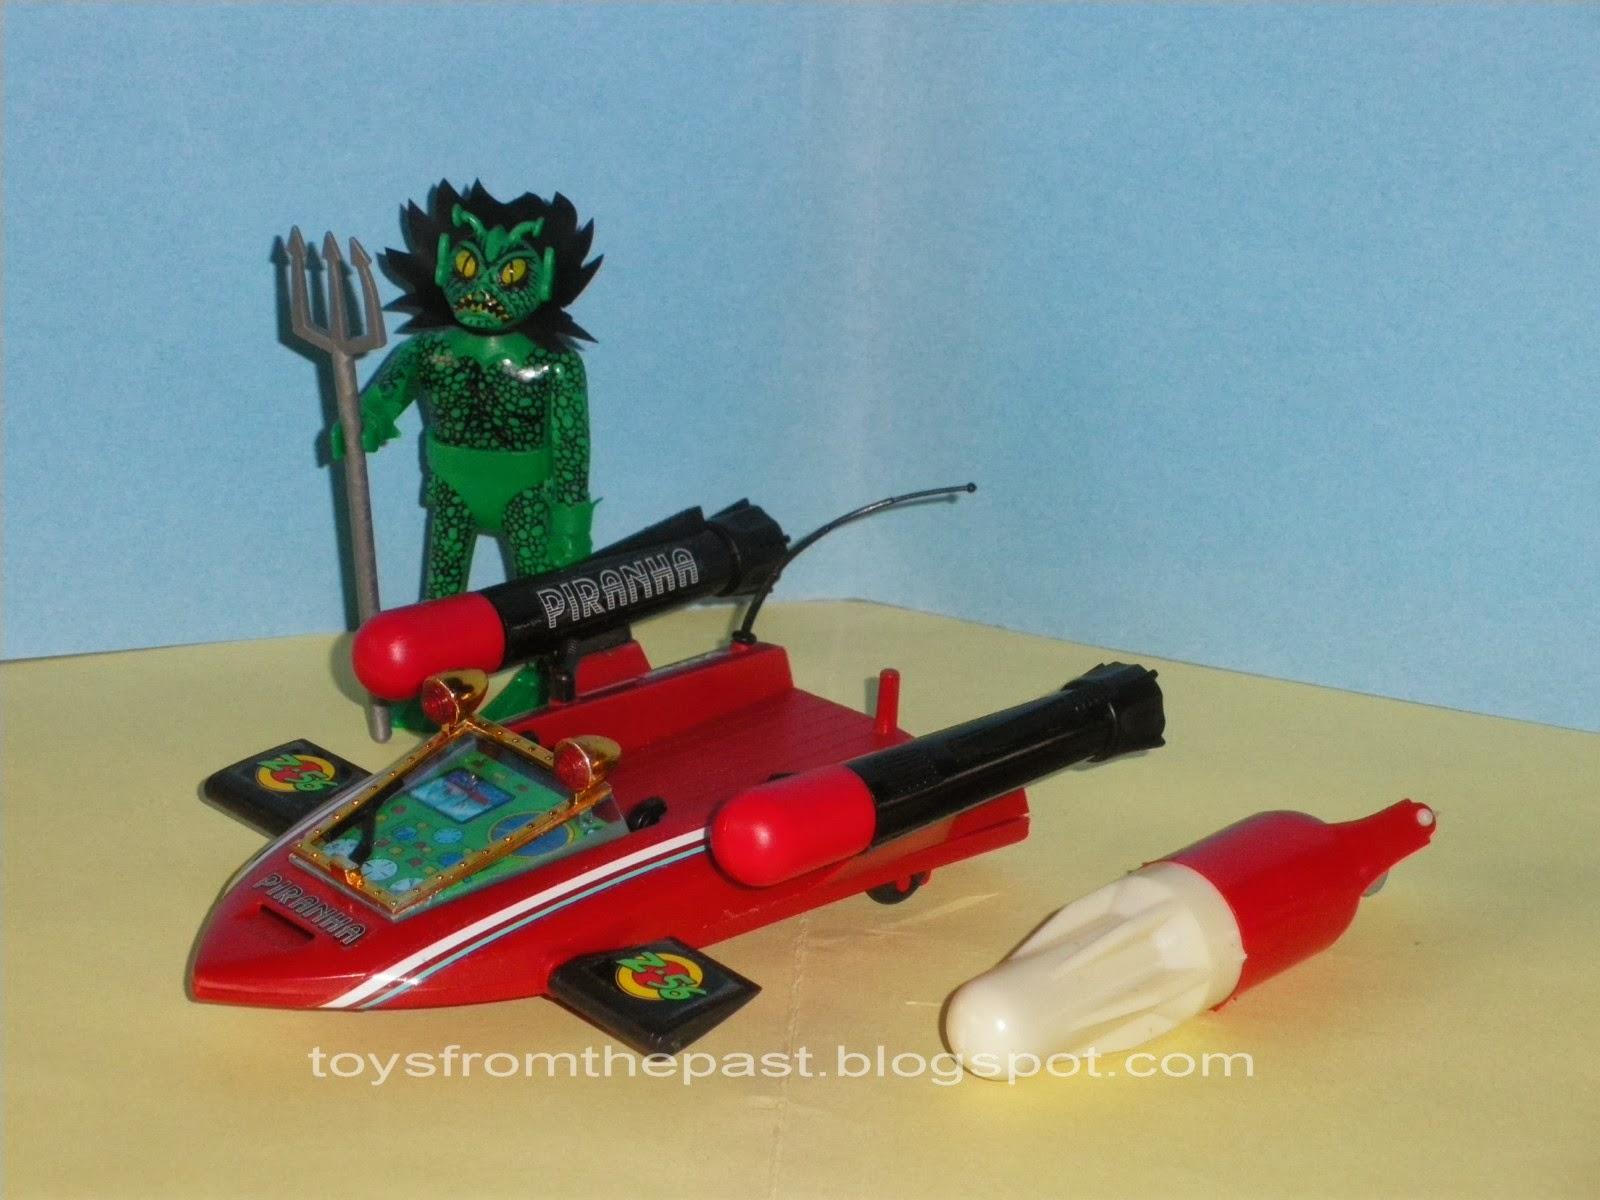 Toys from the Past 333 AIRGAM COMICS  SUPERDIABOLICS